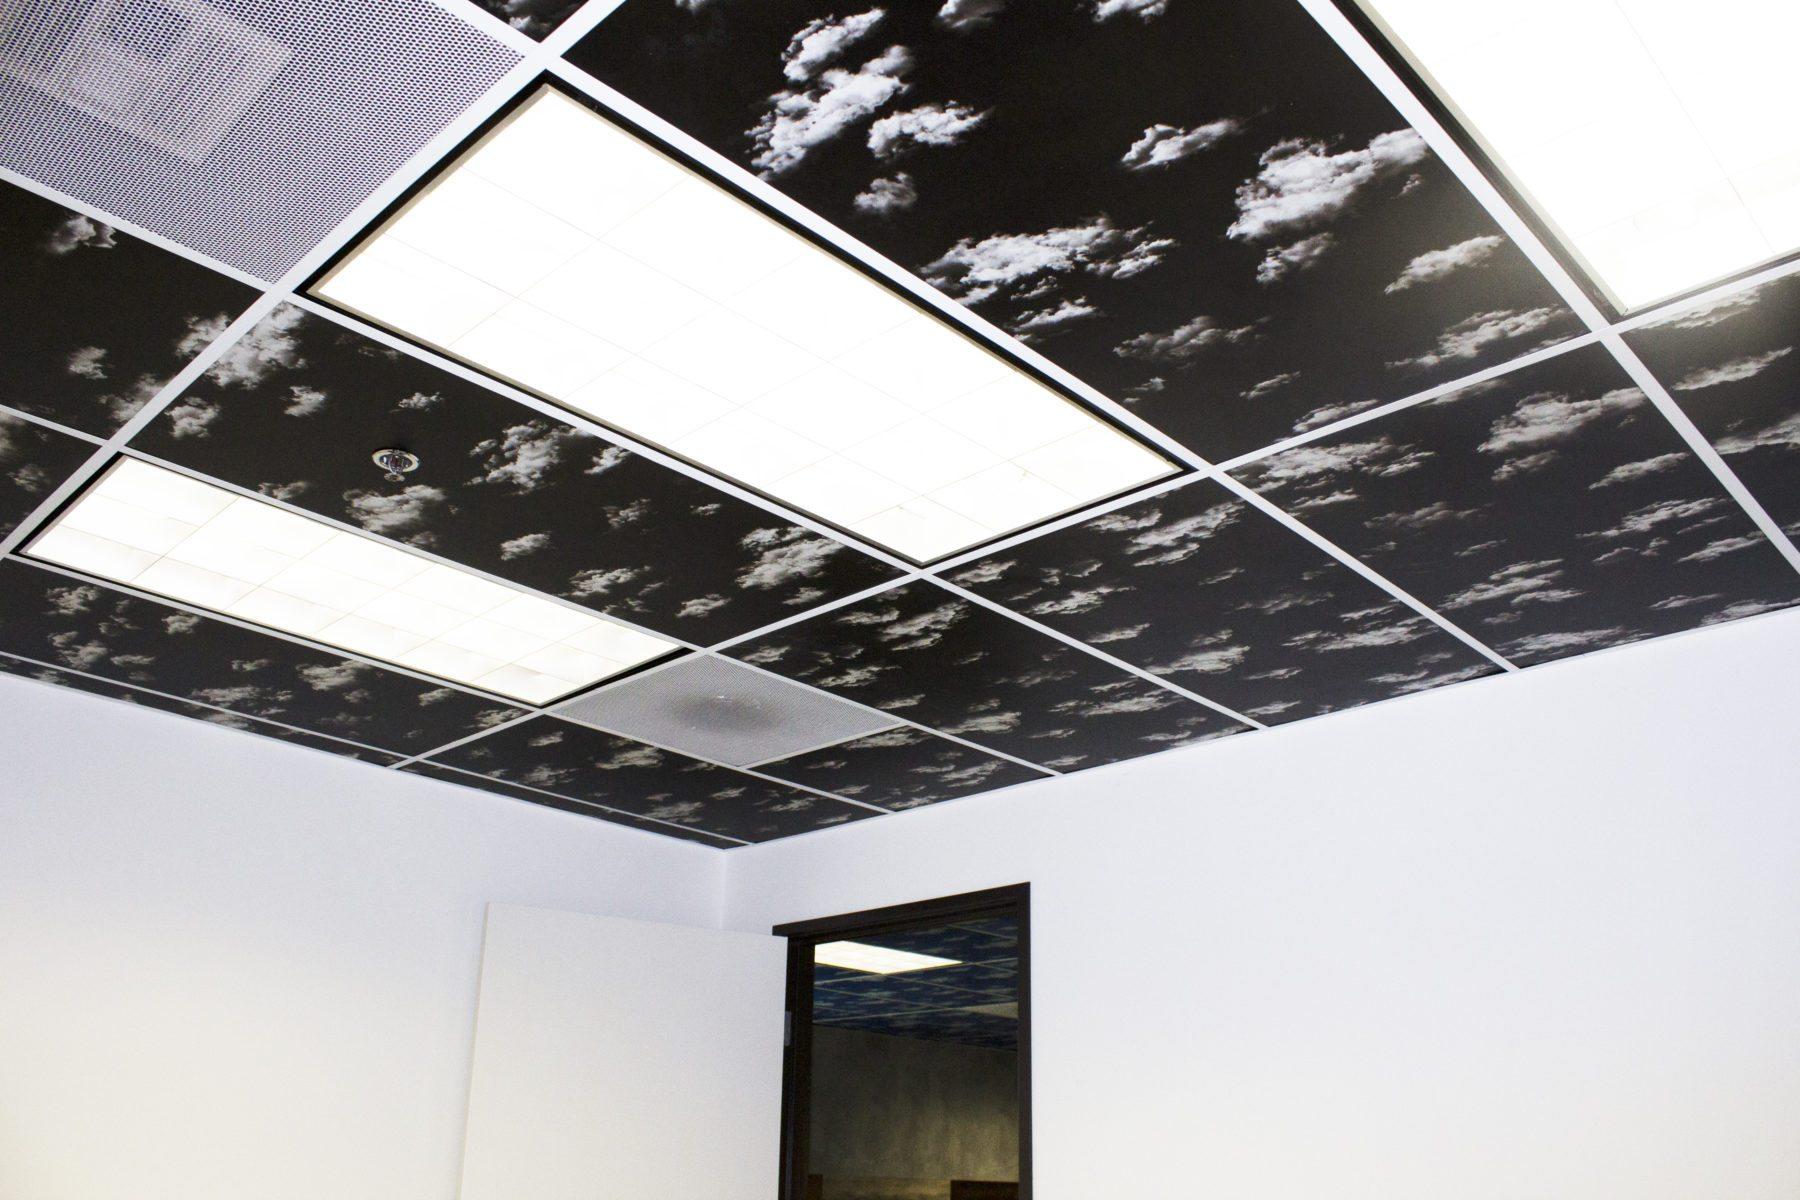 C-8 Midnight Black Ceiling Tiles